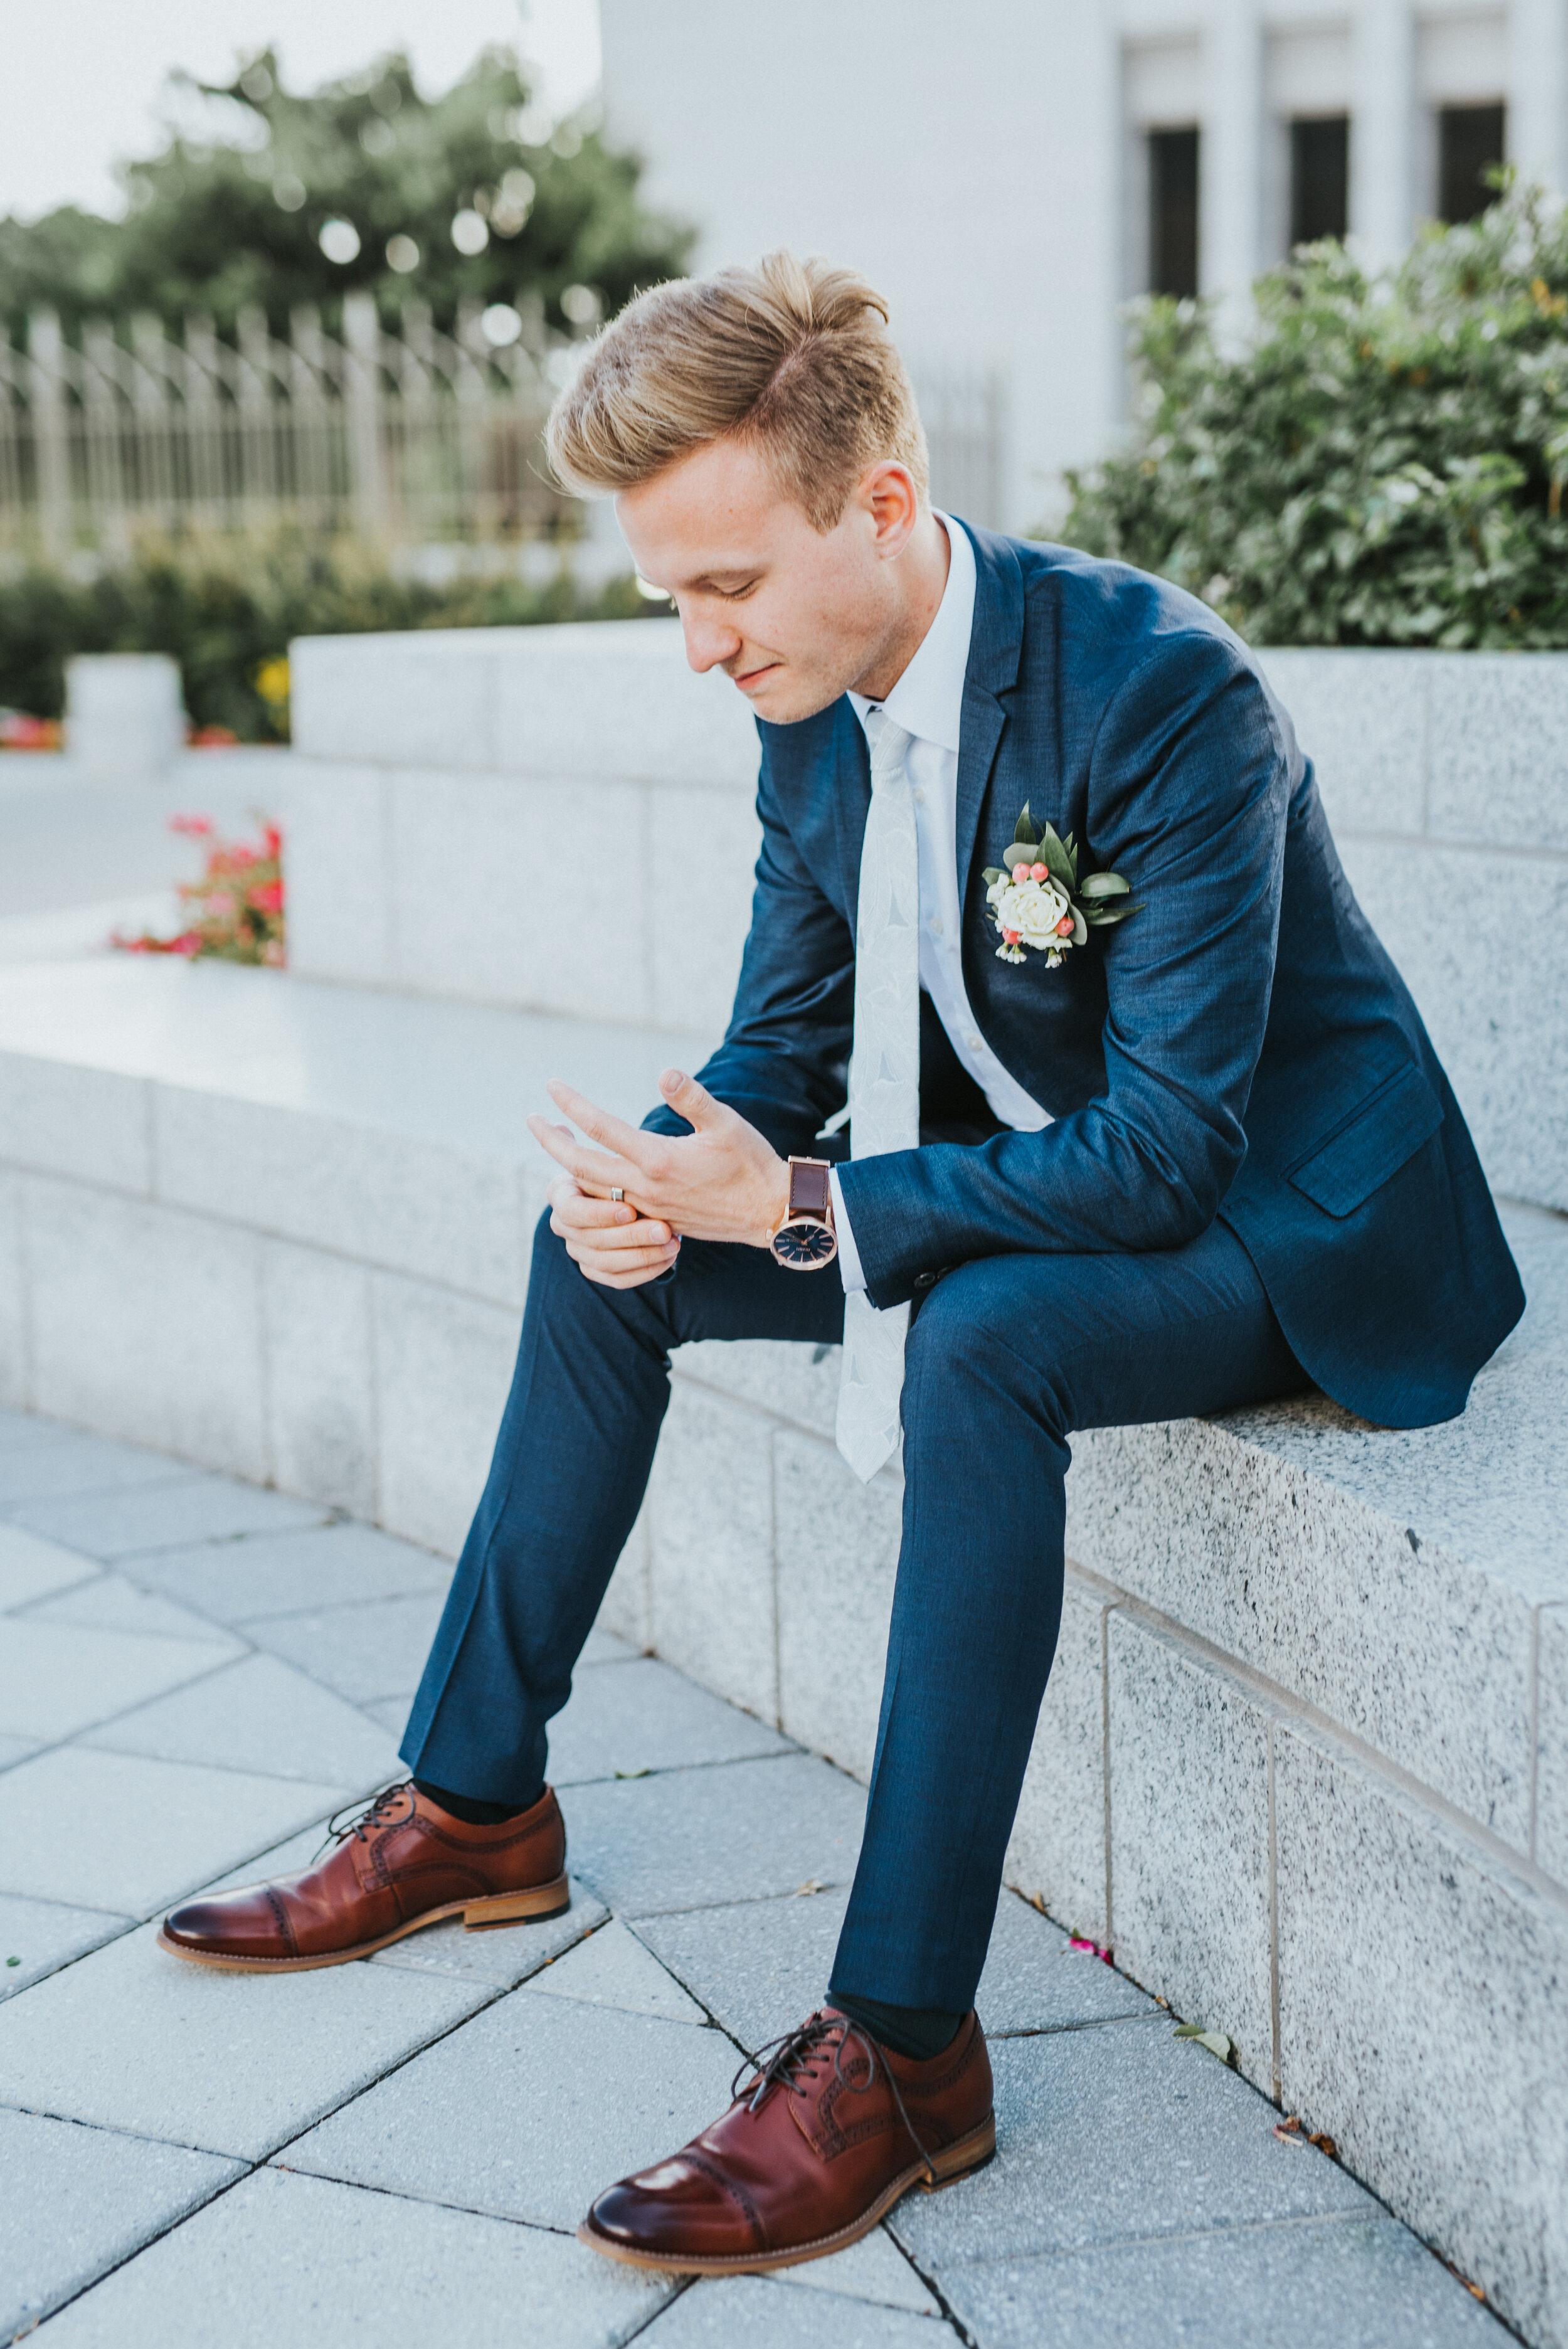 groom_sitting_on_bench.JPG